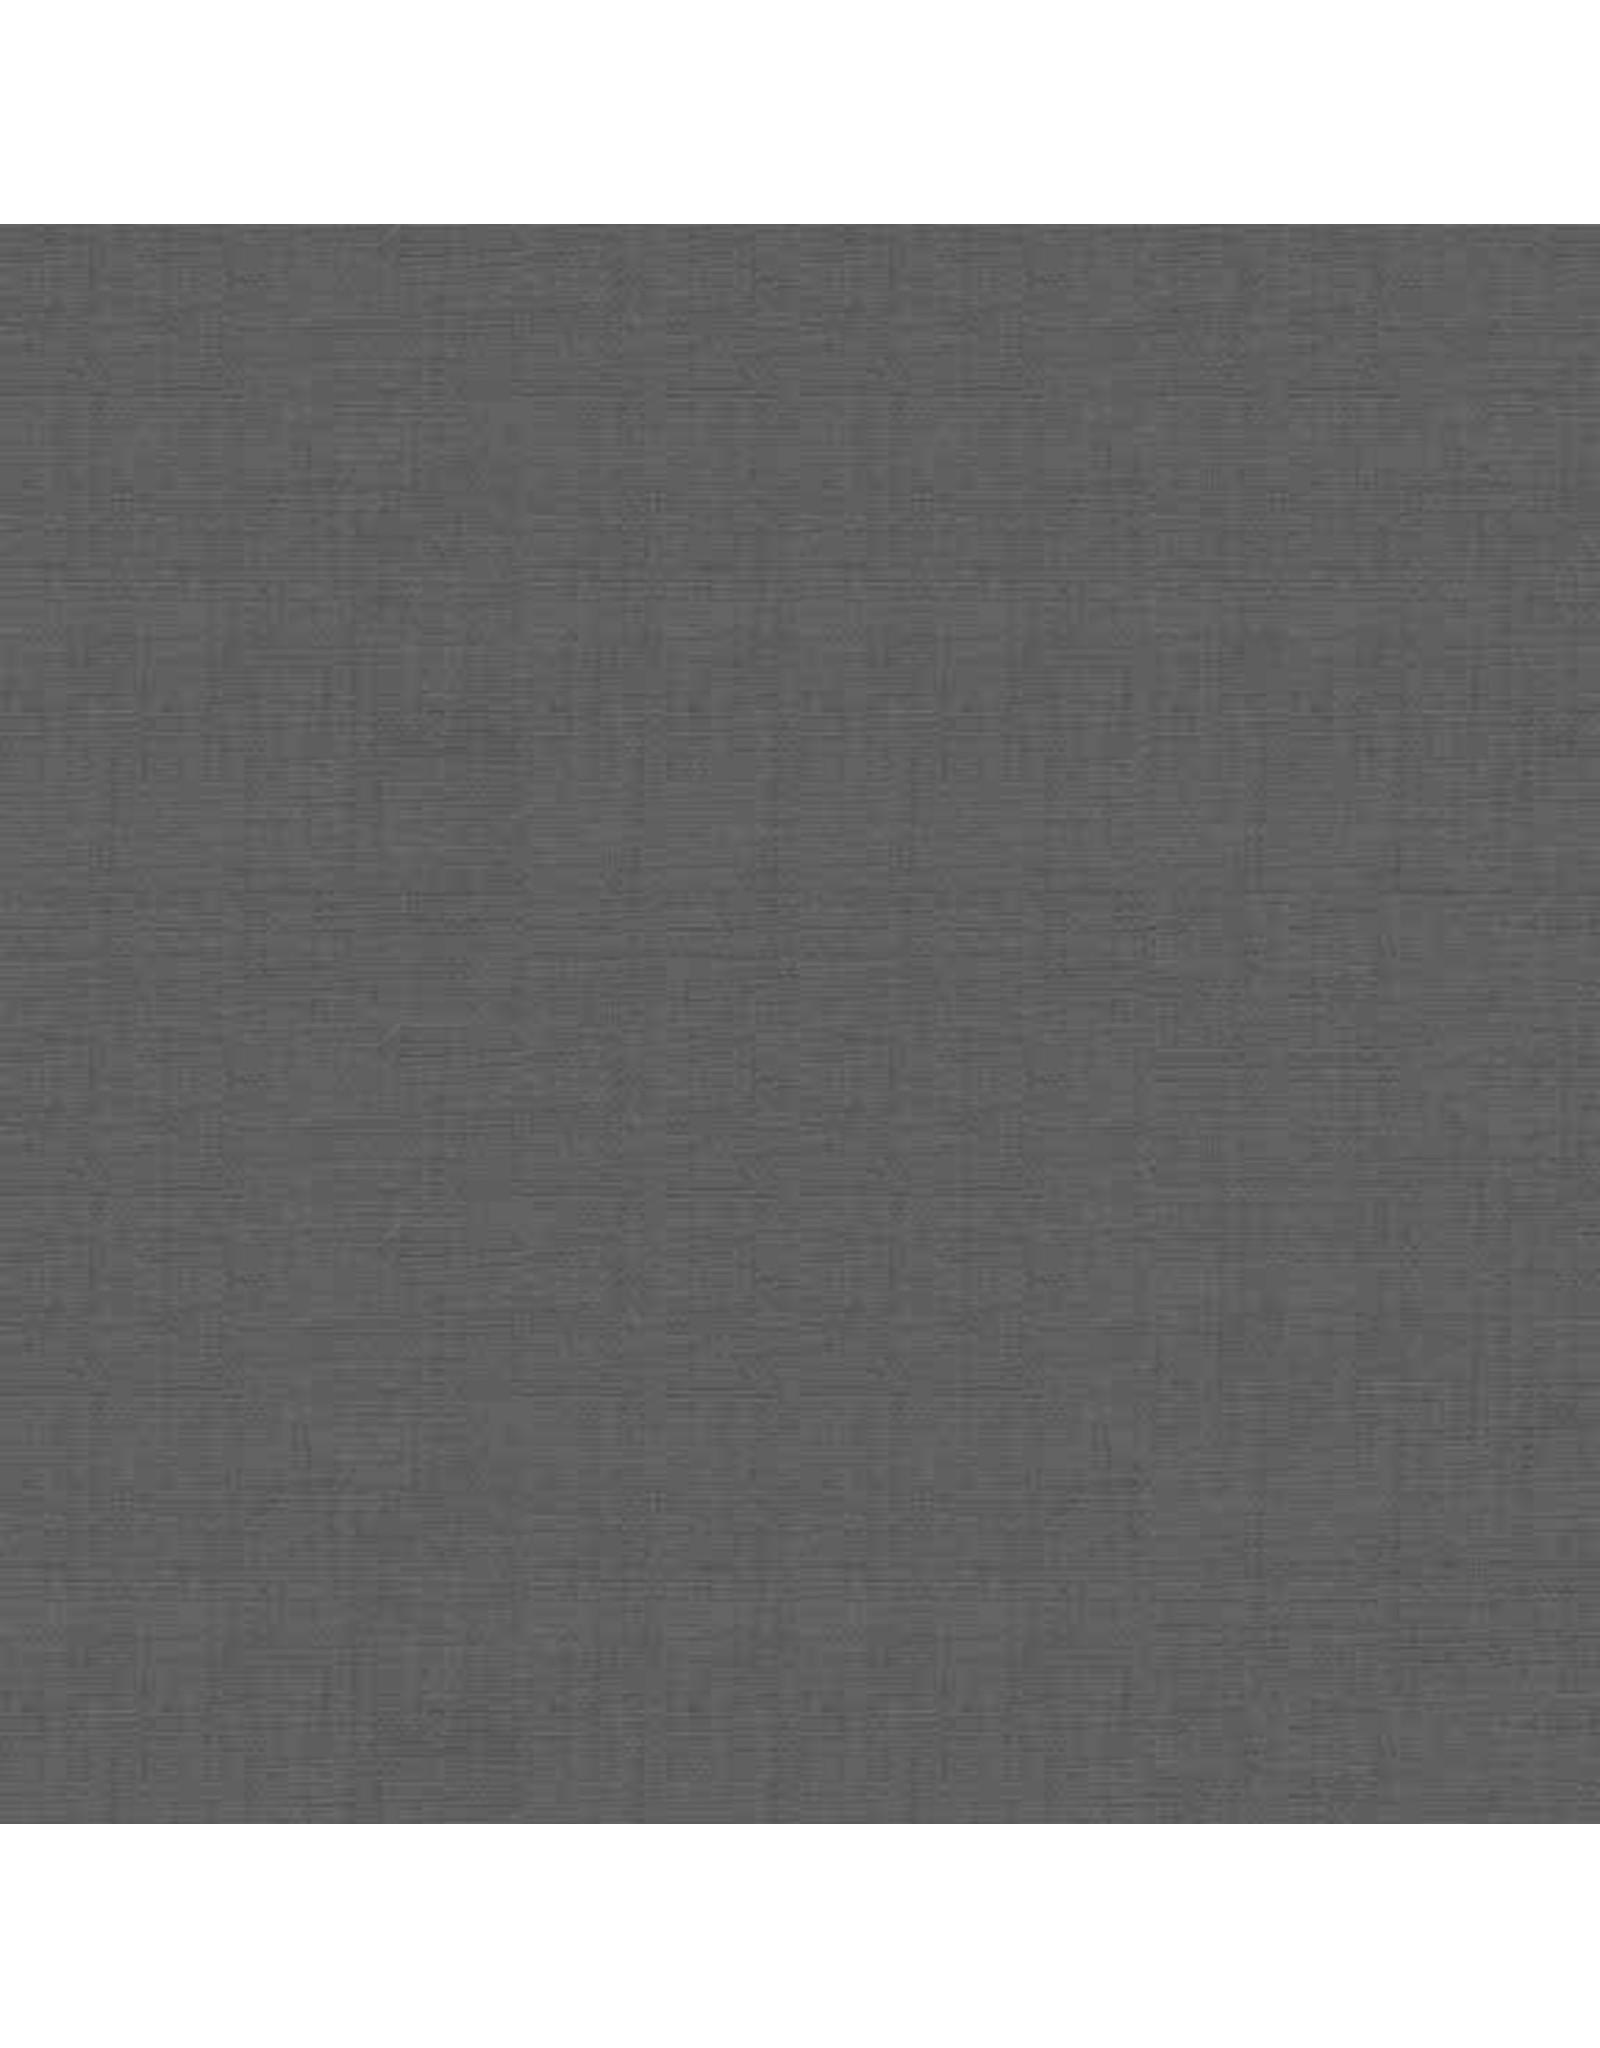 Makower UK Linen Texture - Slate